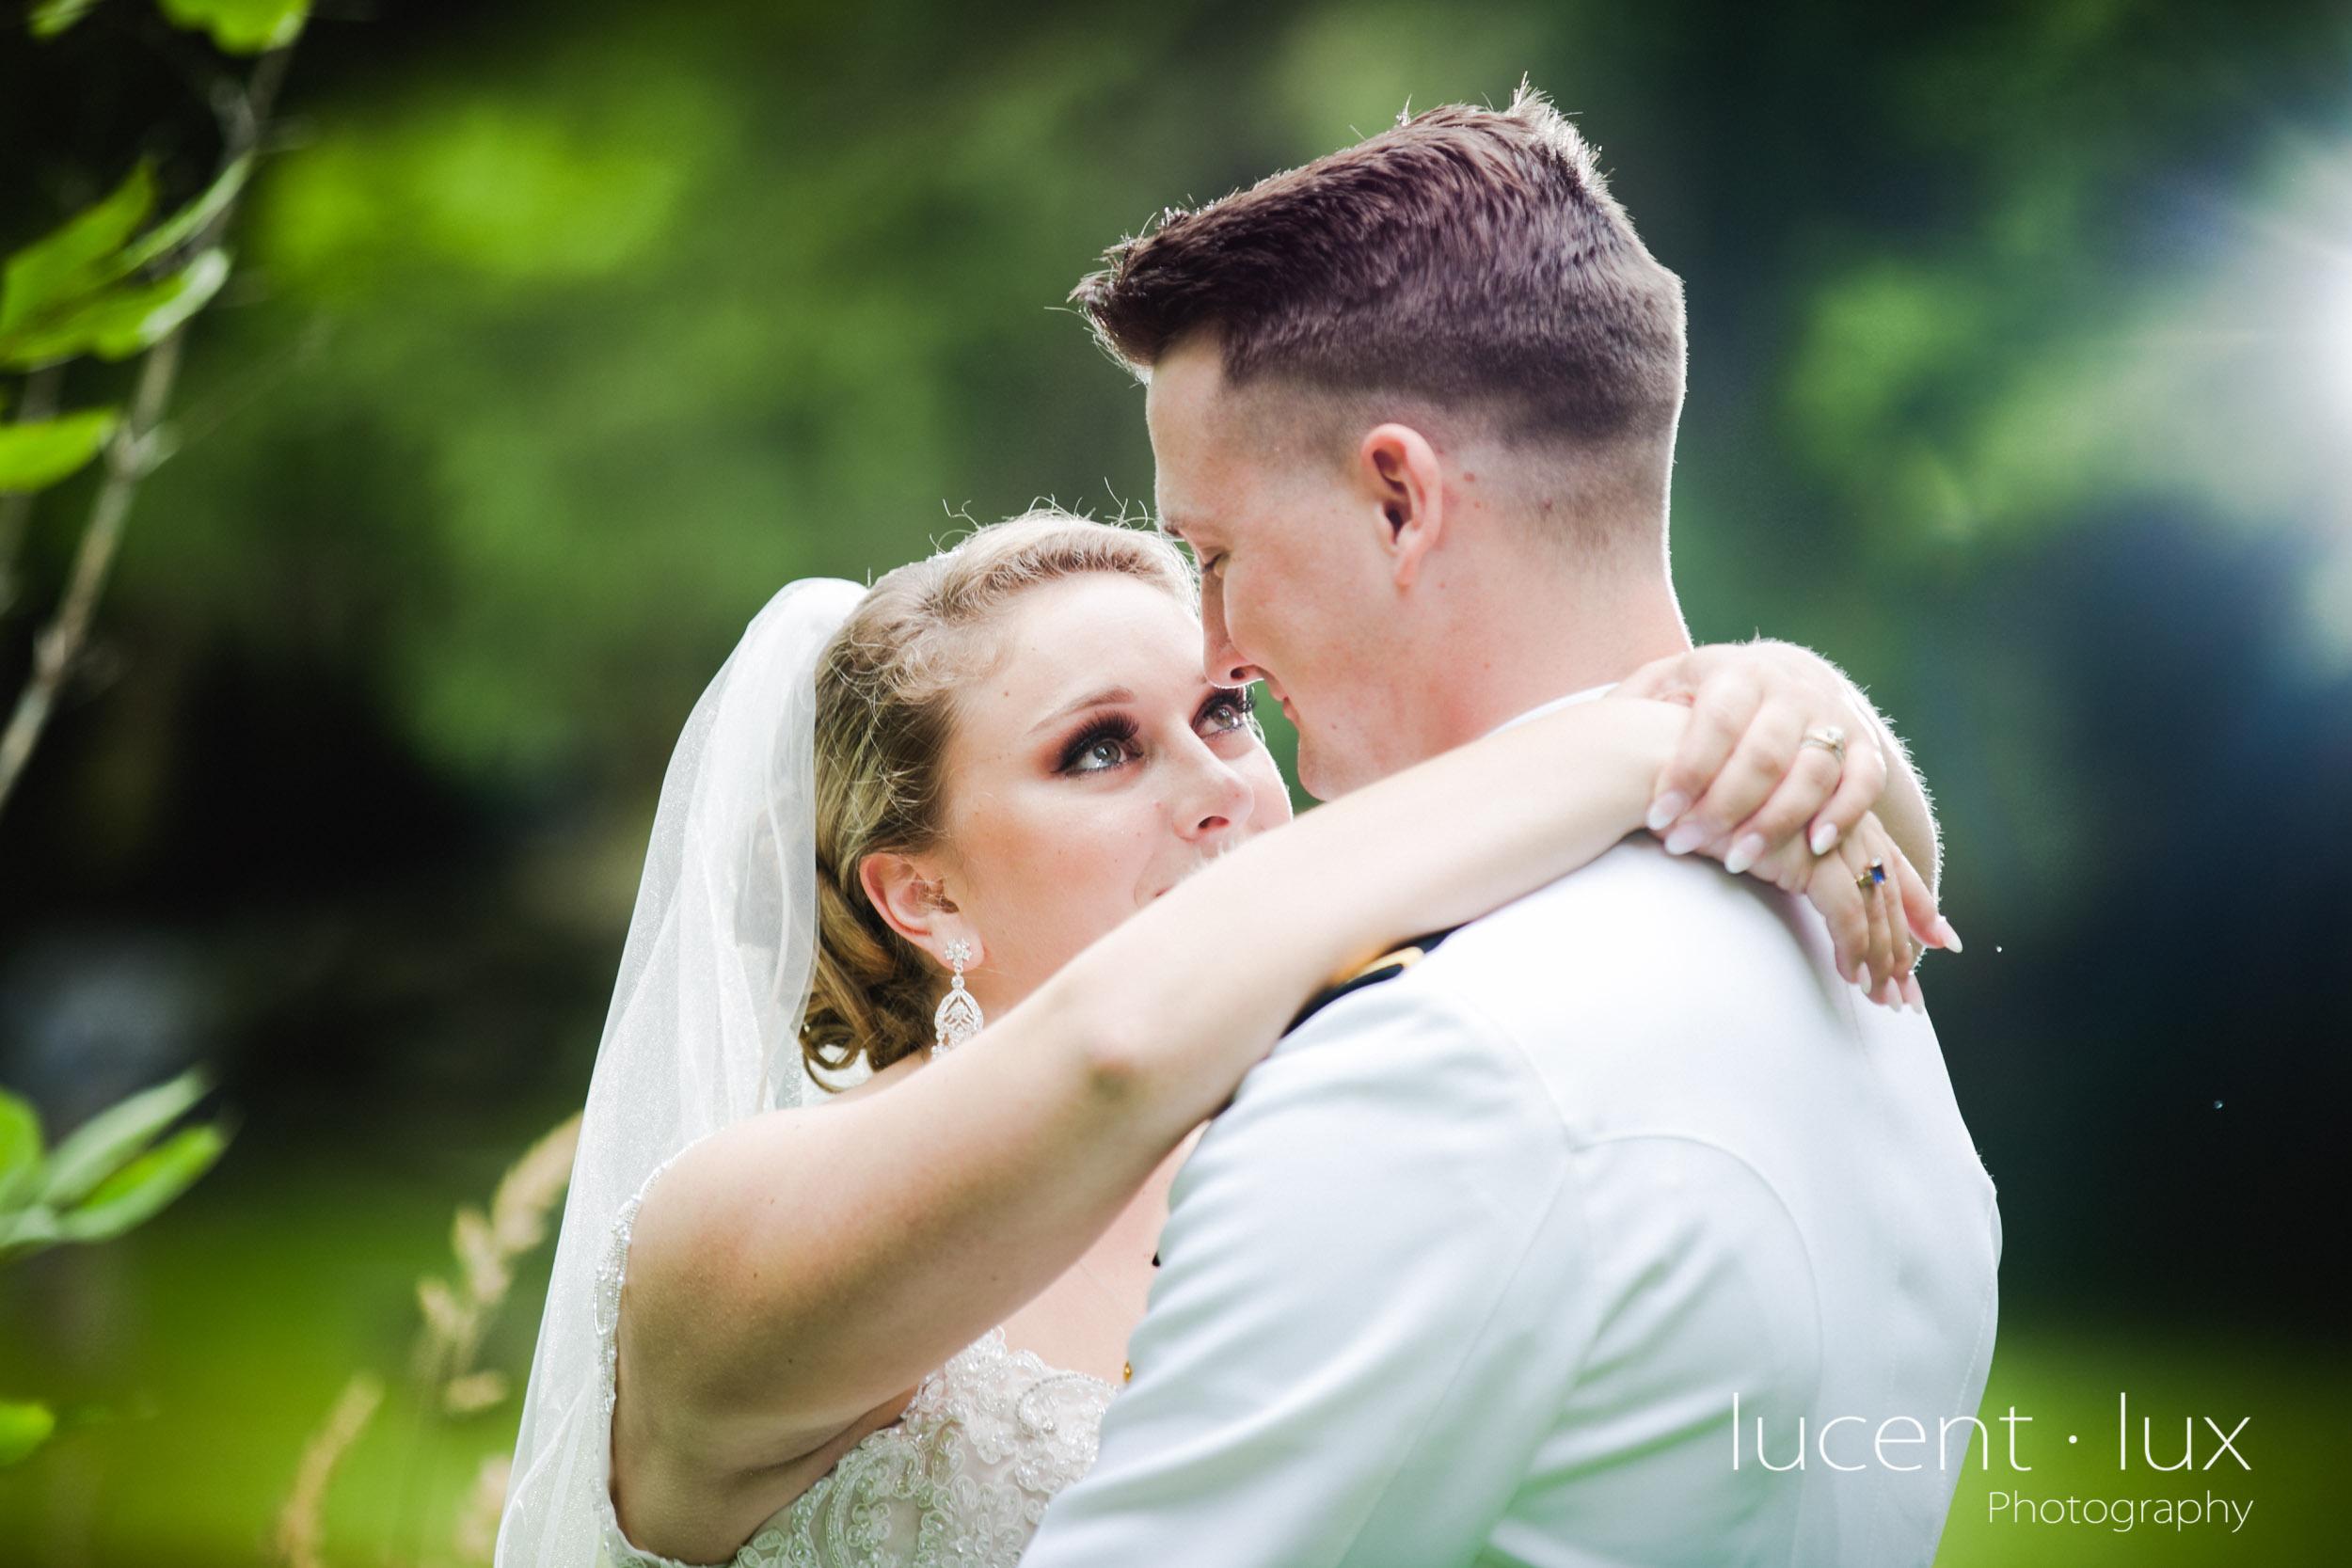 Wedding-Photography-Maryland-Pennsylvania-Photographer-Mendenhall-Inn-Media-Portrait-Event-140.jpg